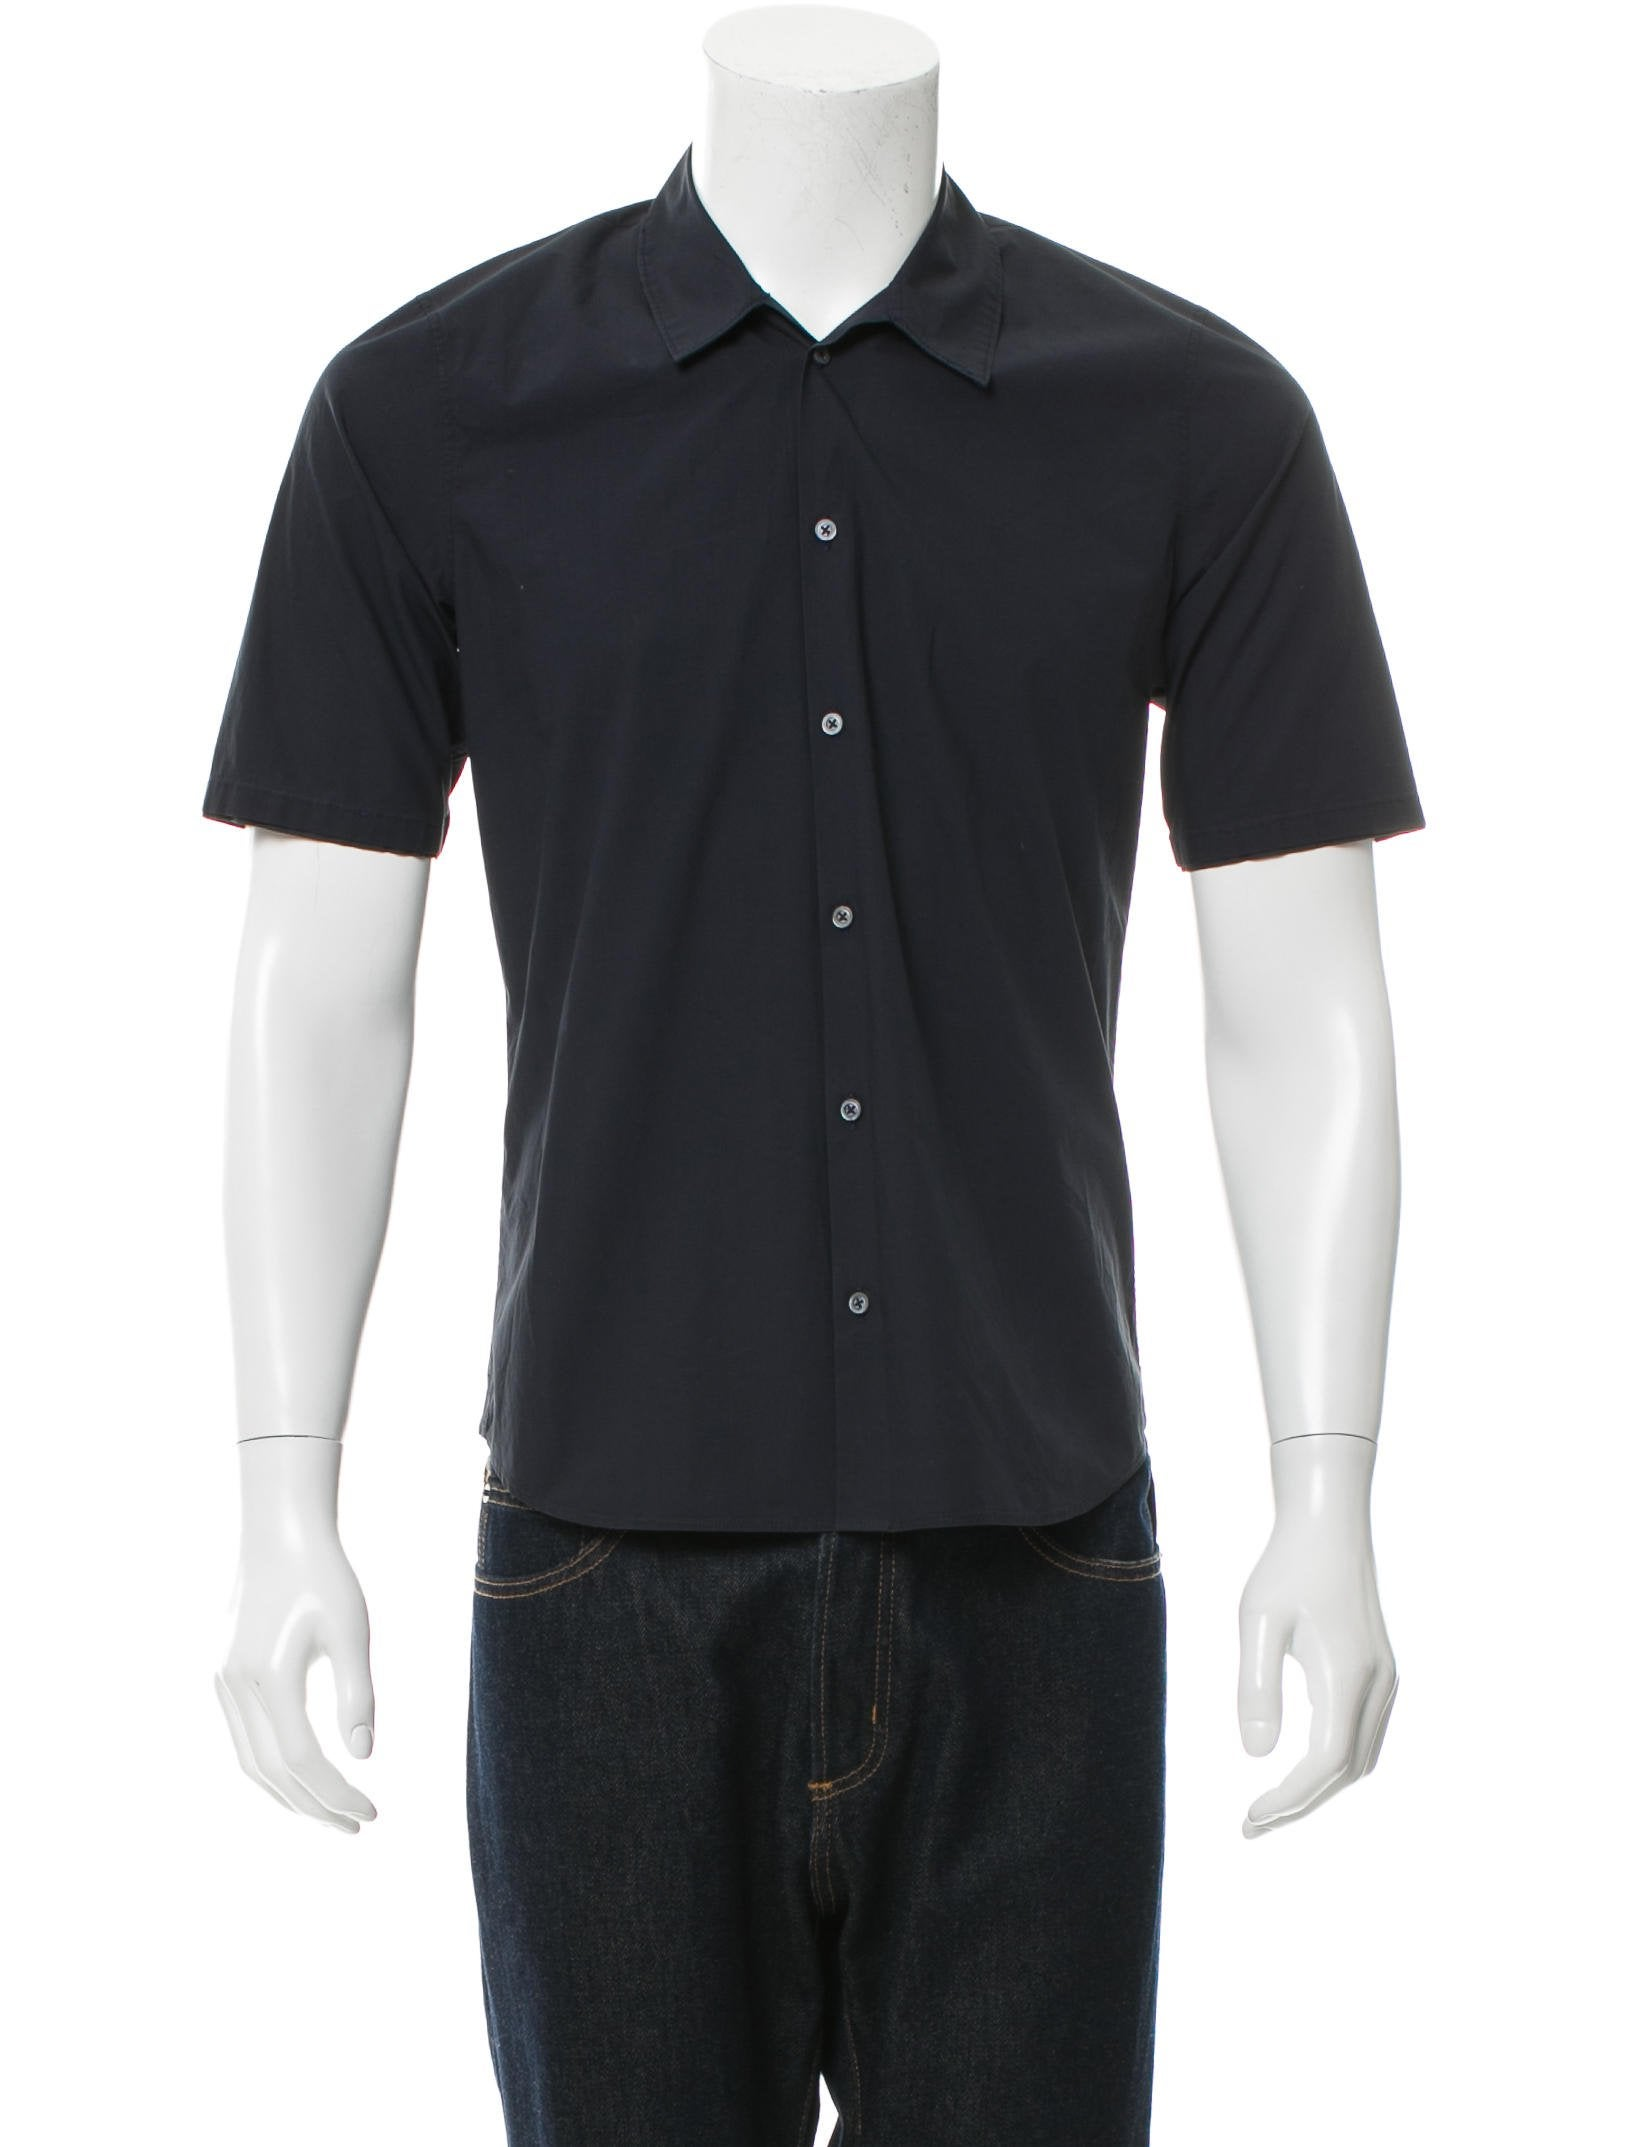 Jil Sander Short Sleeve Button Up Shirt Clothing